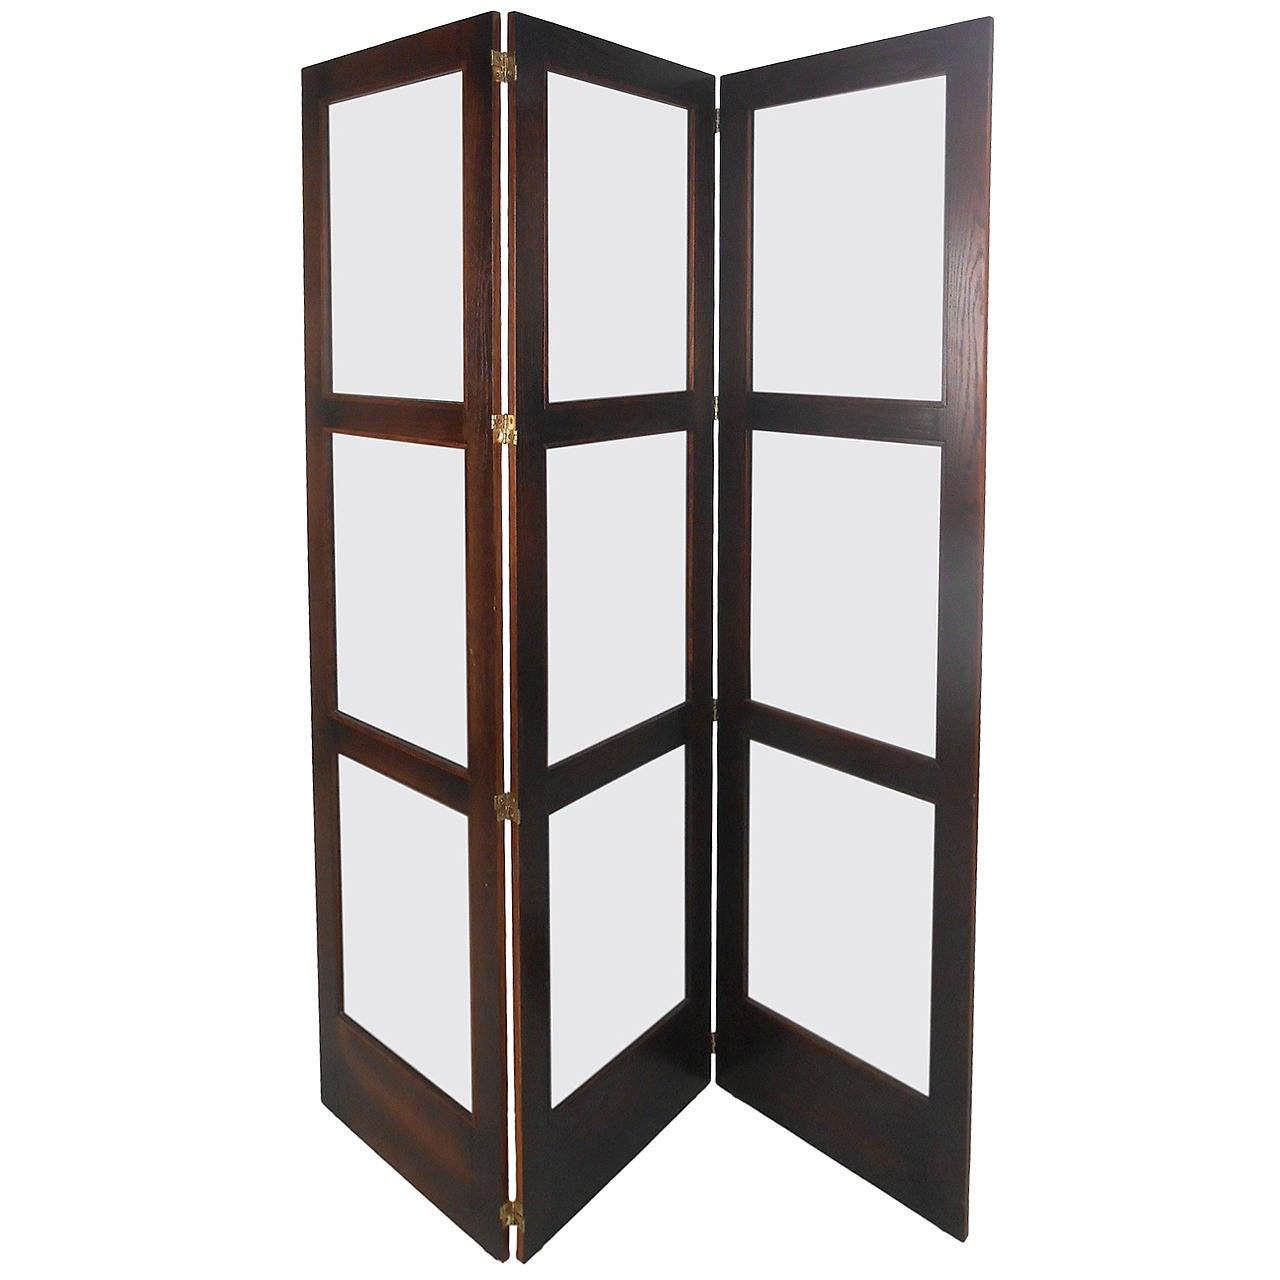 unique midcentury modern glass and hardwood room divider folding  - unique midcentury modern glass  hardwood room divider folding screen